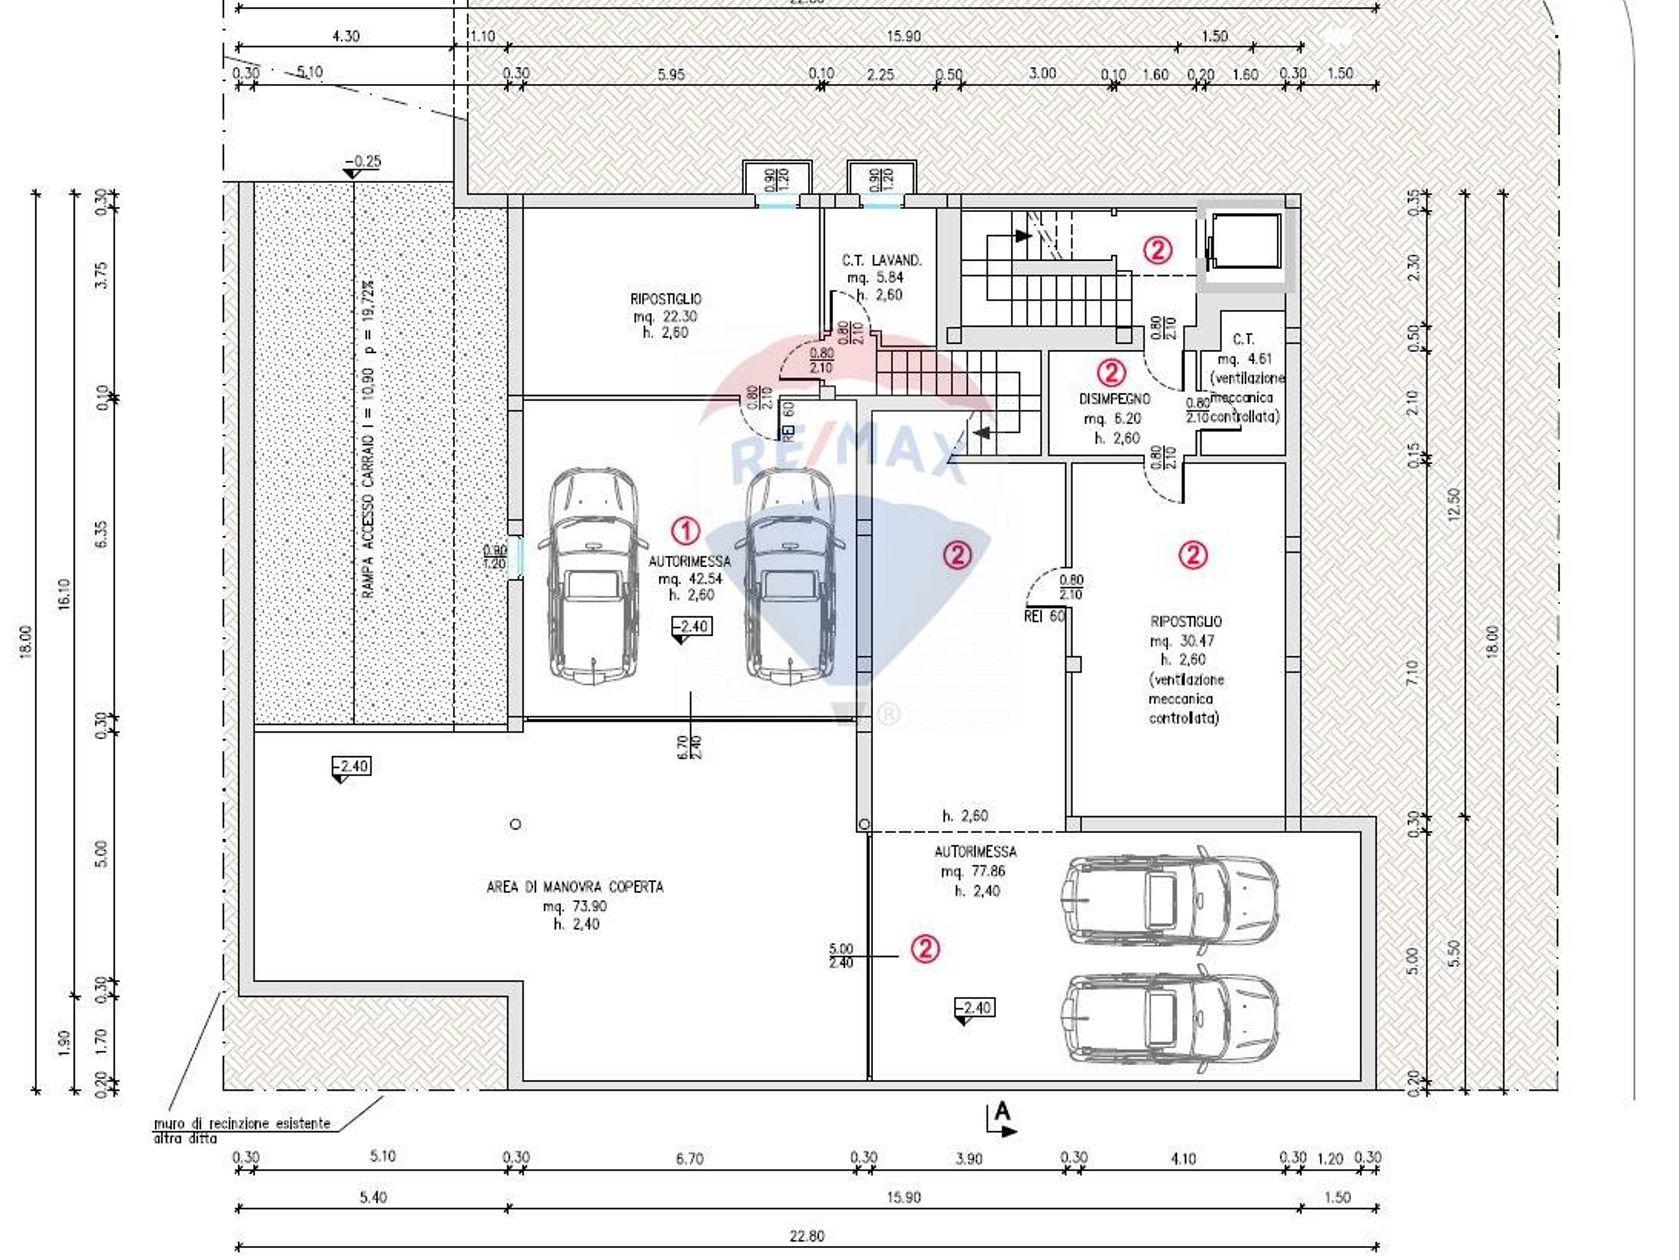 Appartamento Zanè, VI Vendita - Planimetria 4